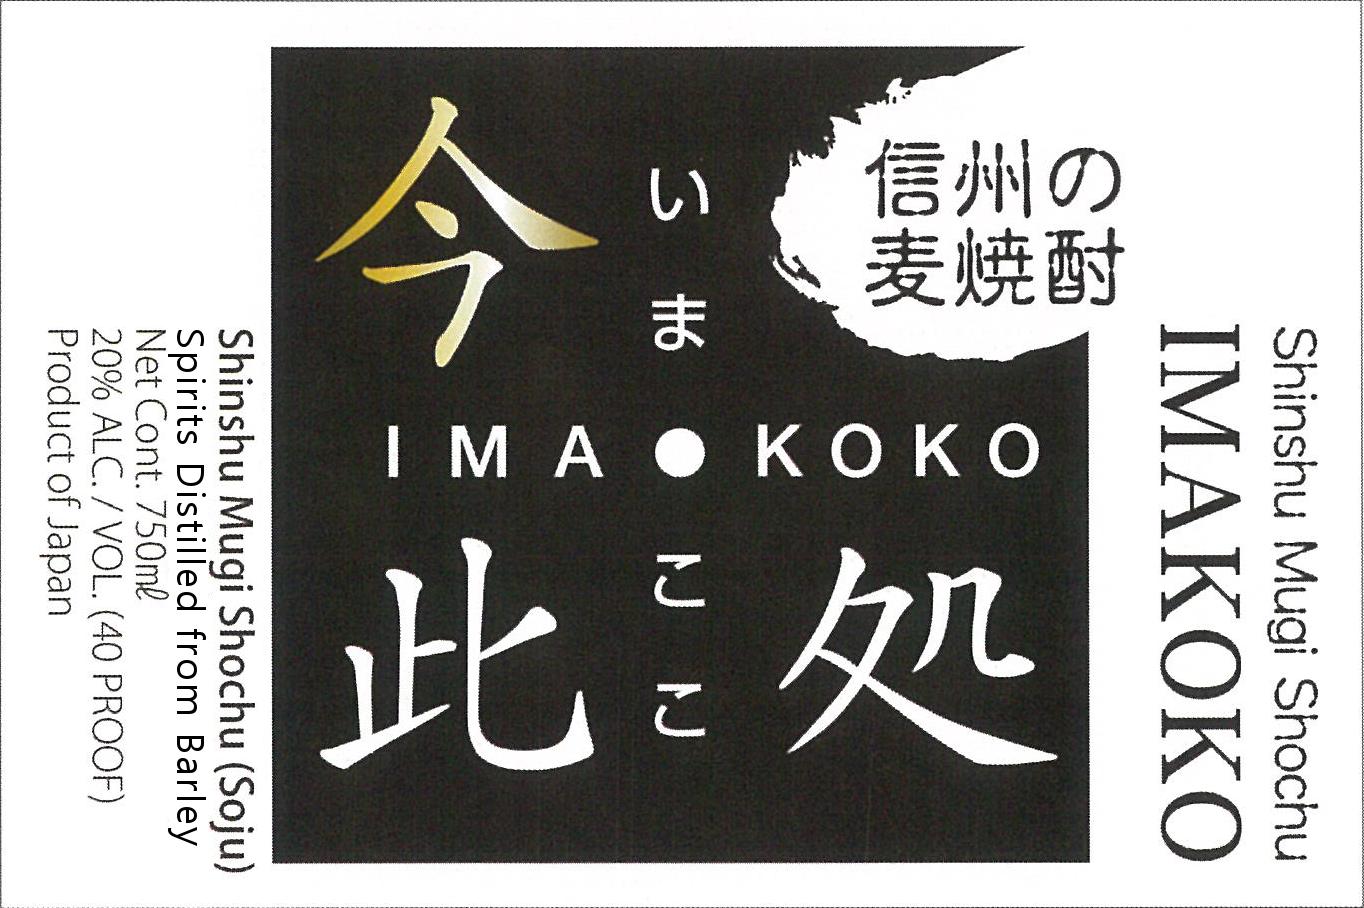 Japan Imakoko Shochu